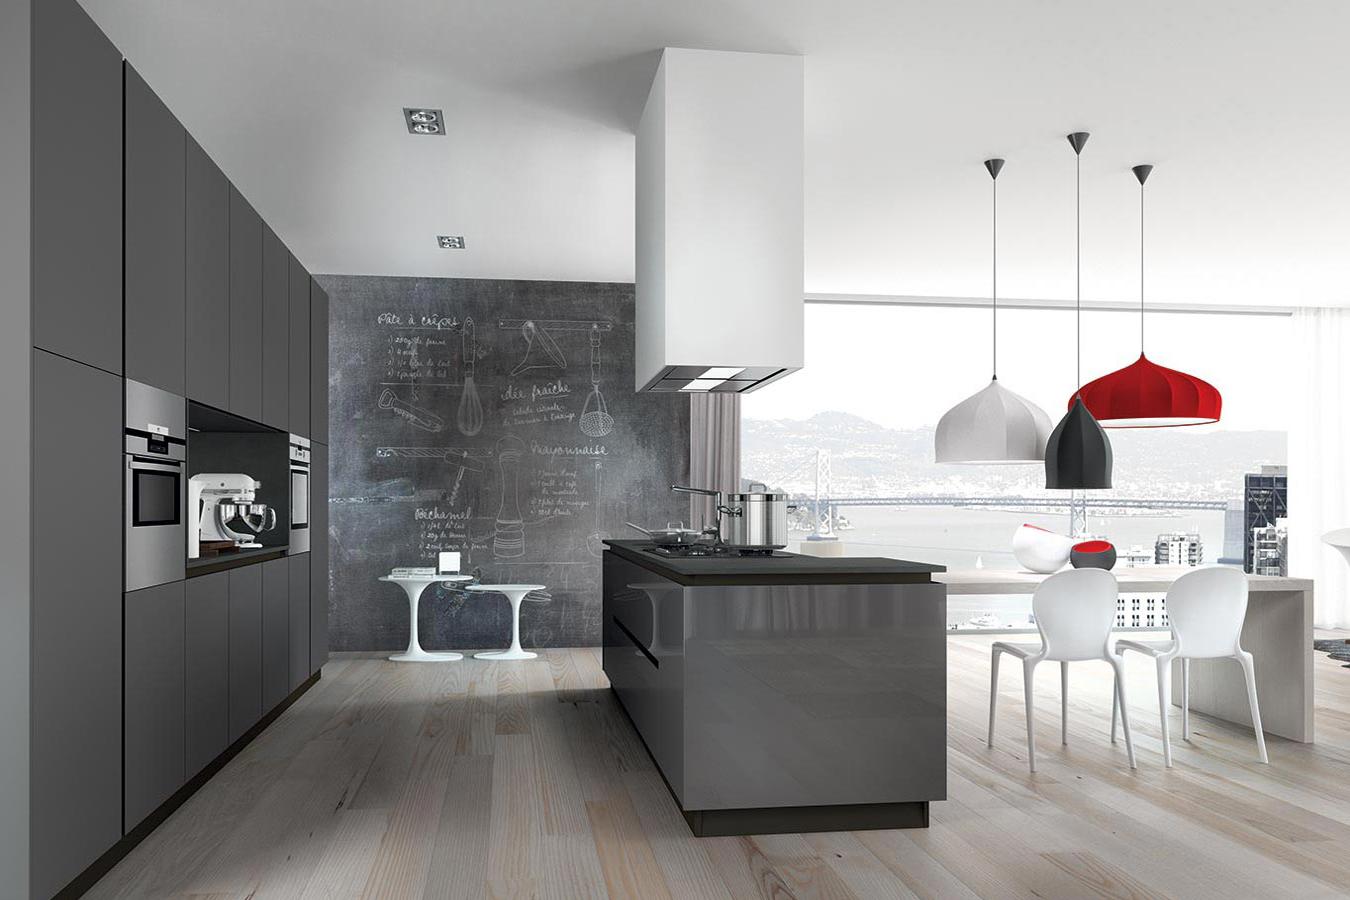 Cucina glass di arredo3 righetti mobili novara for Arredo cucina moderna